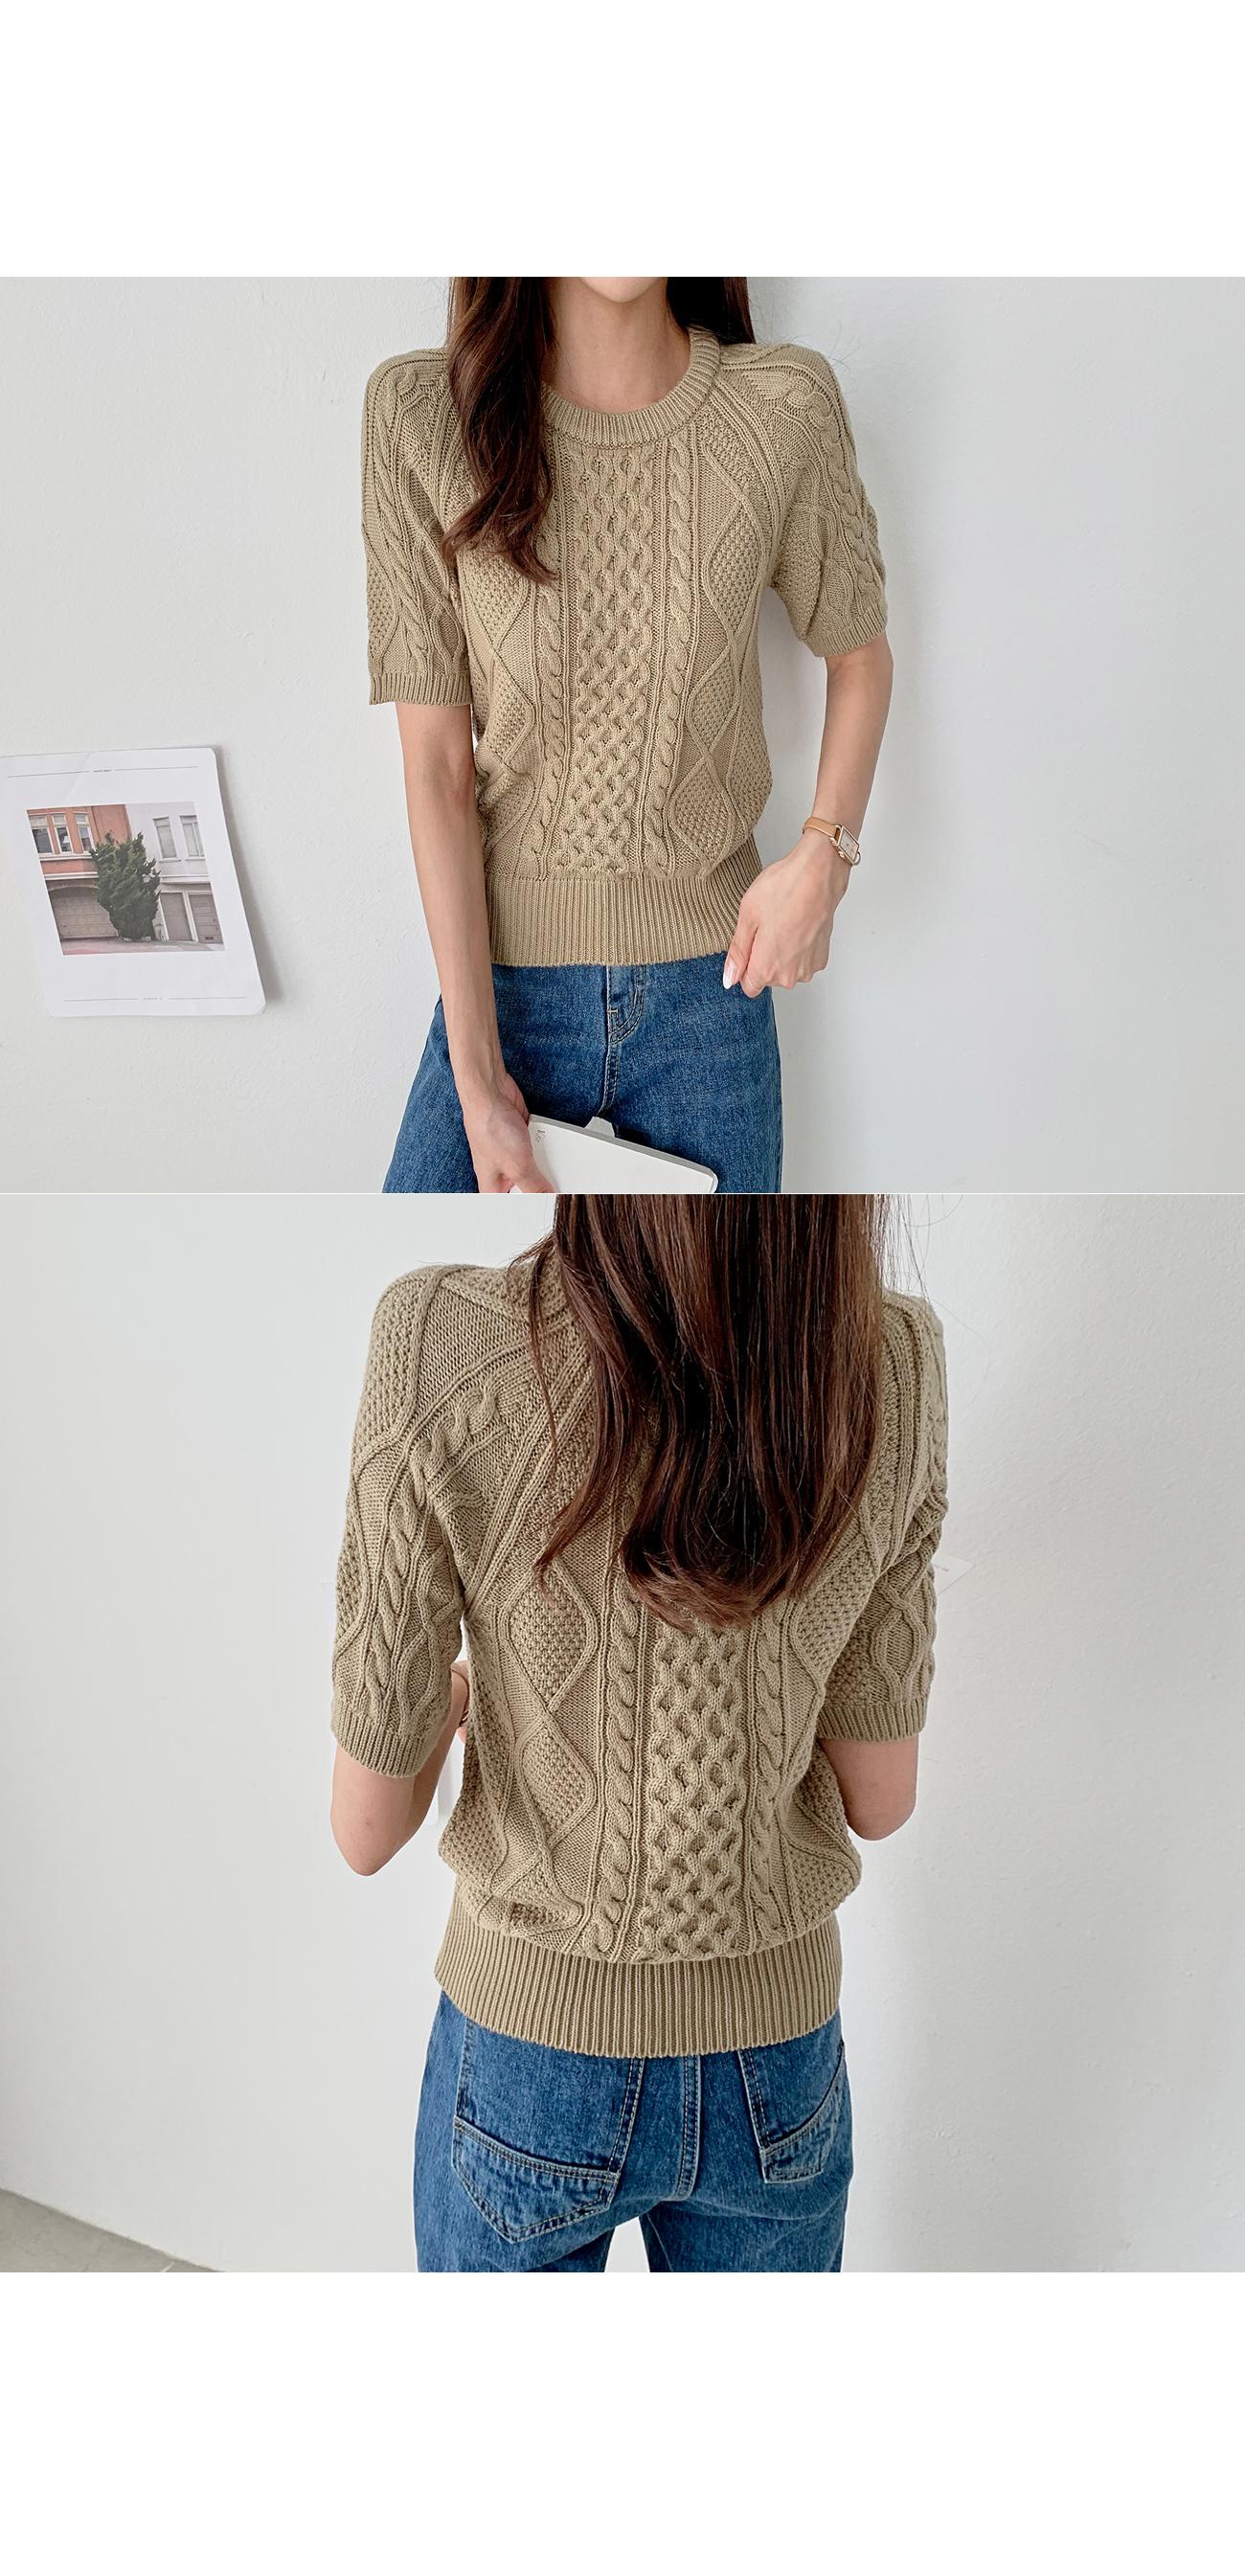 Short sleeve knit #107495